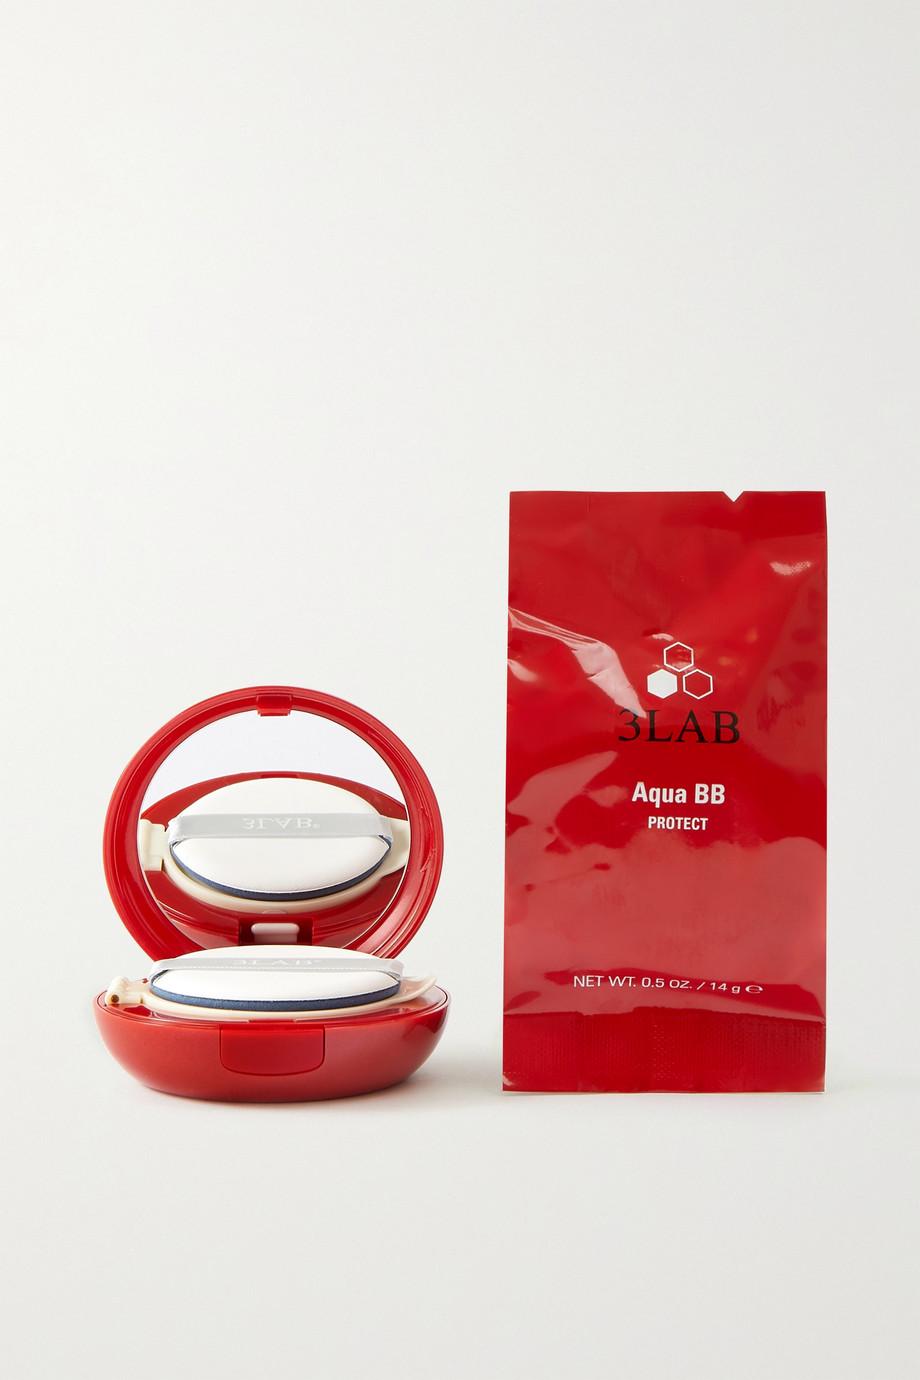 3LAB Aqua BB Protect – 03 Dark, 2 x 14 g – BB Cream